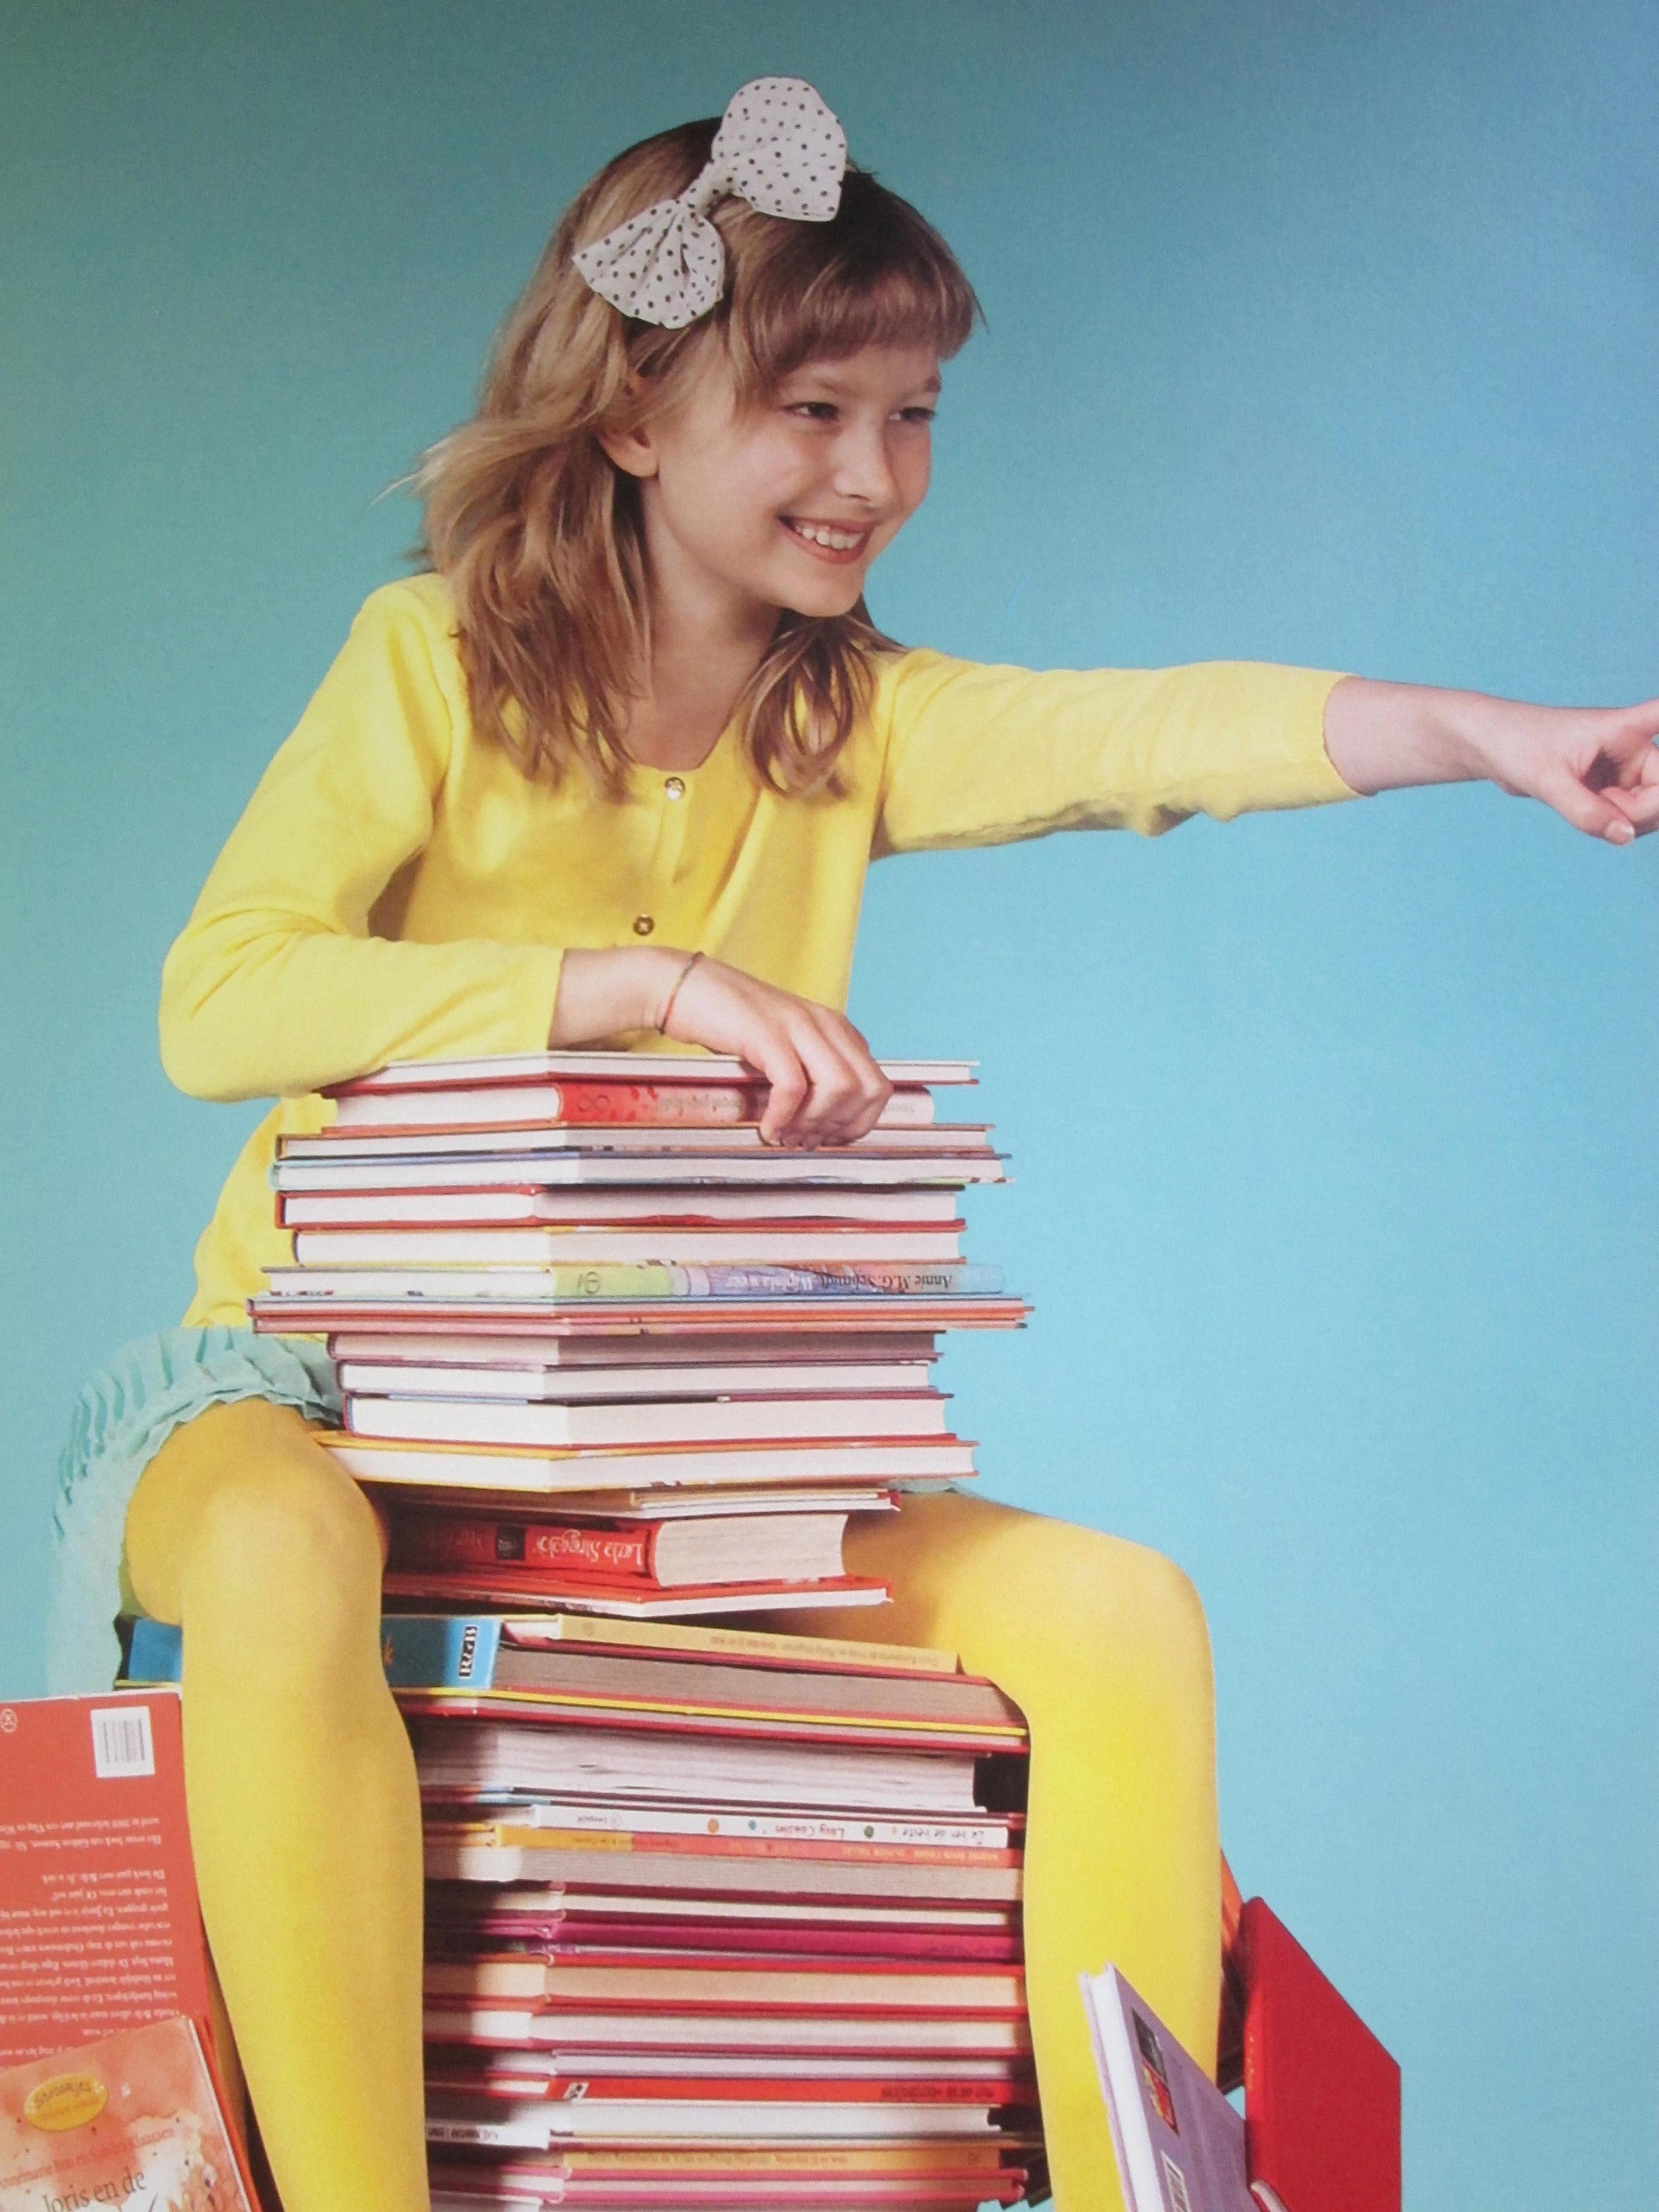 Kinderboekenweek 2012: Hallo Wereld! Hallo Indonesië!